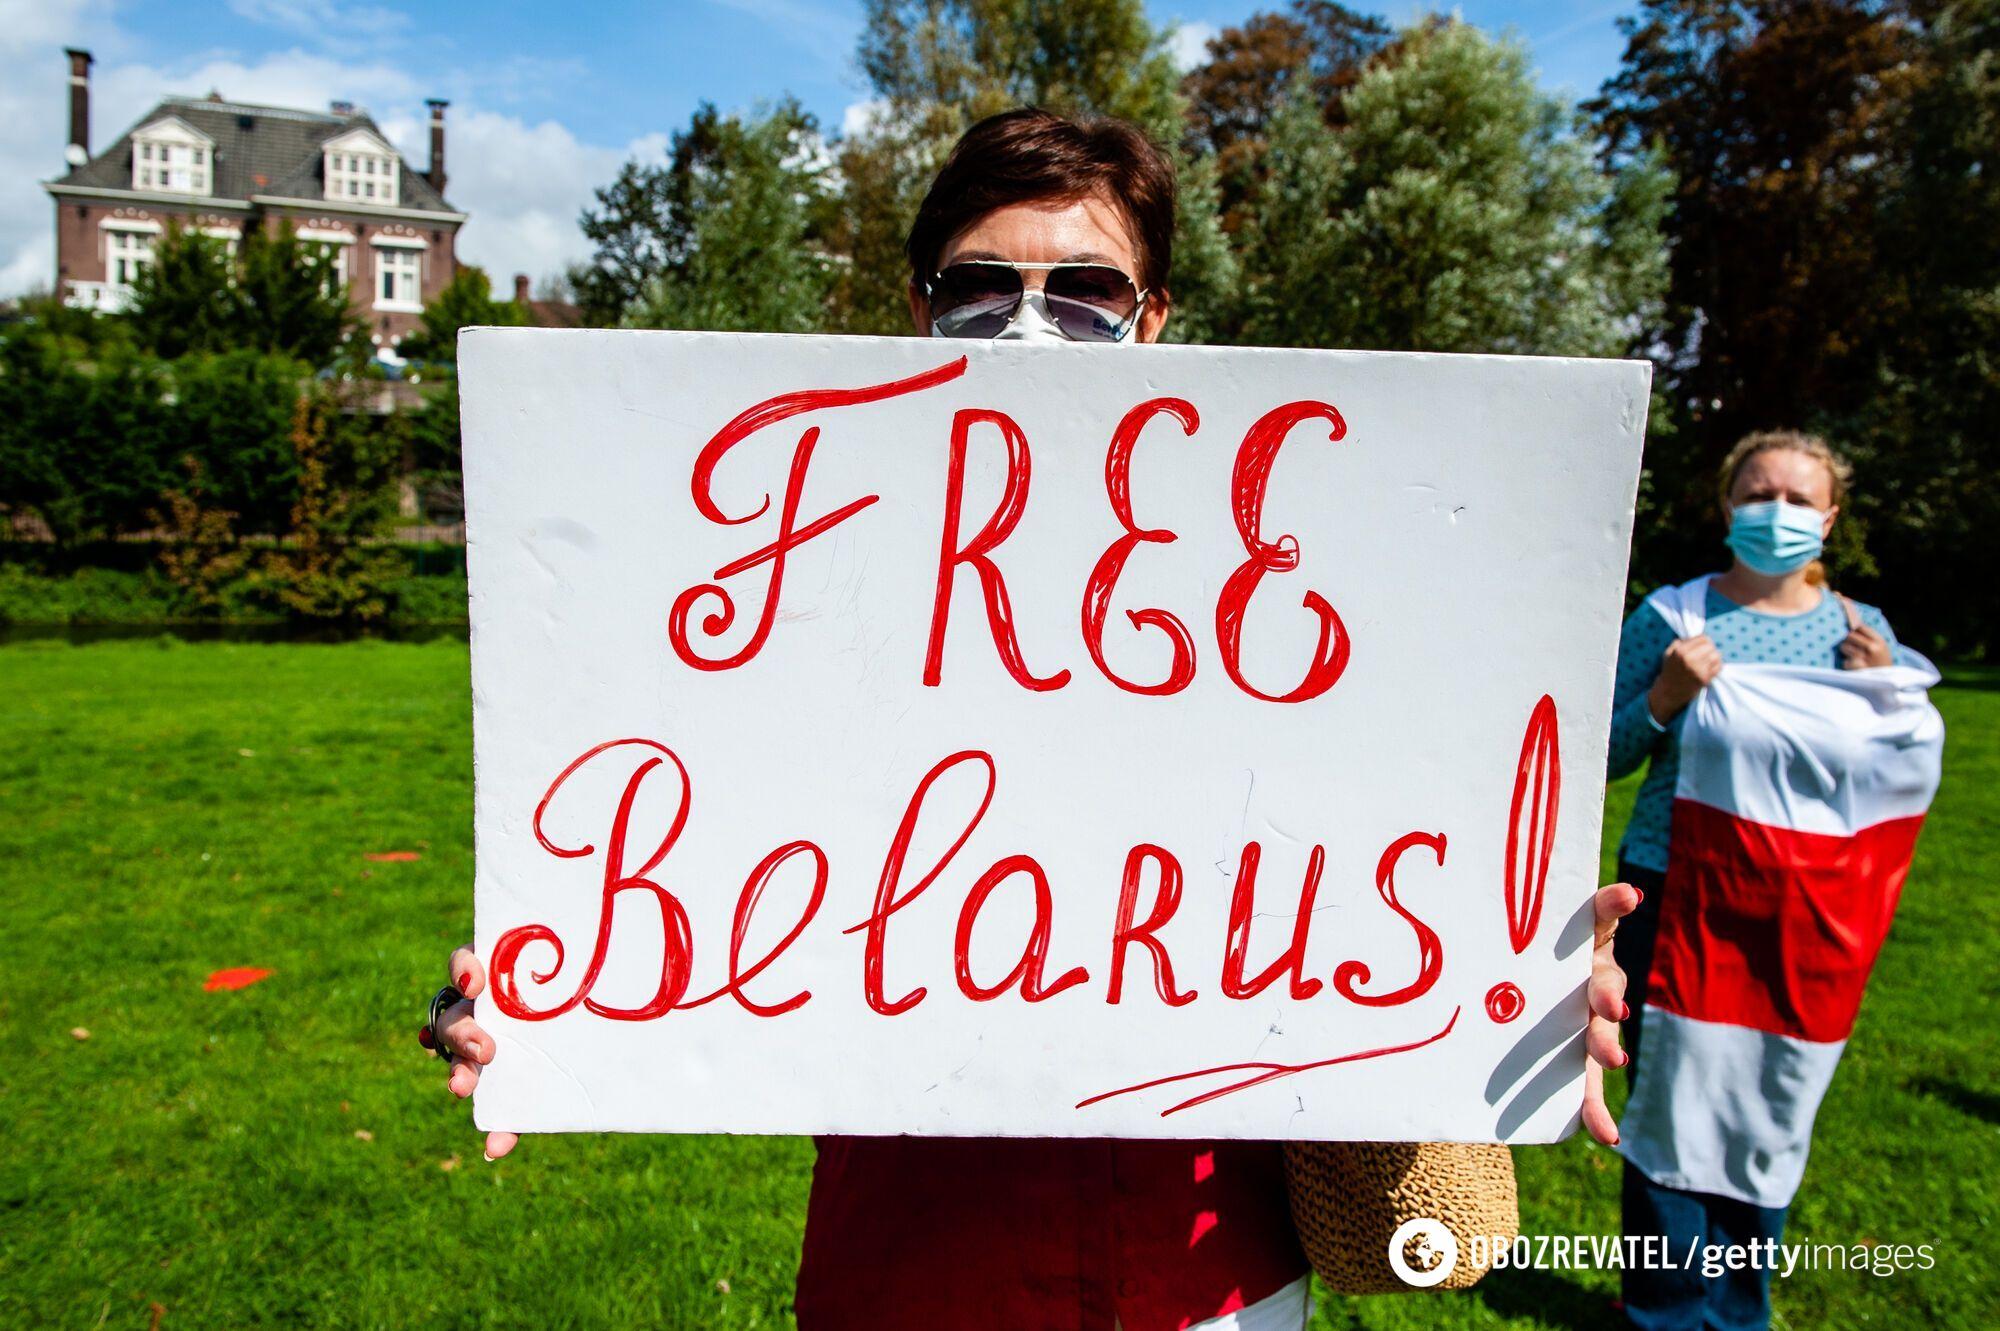 Митинг в поддержку протестов в Беларуси в Нидерландах